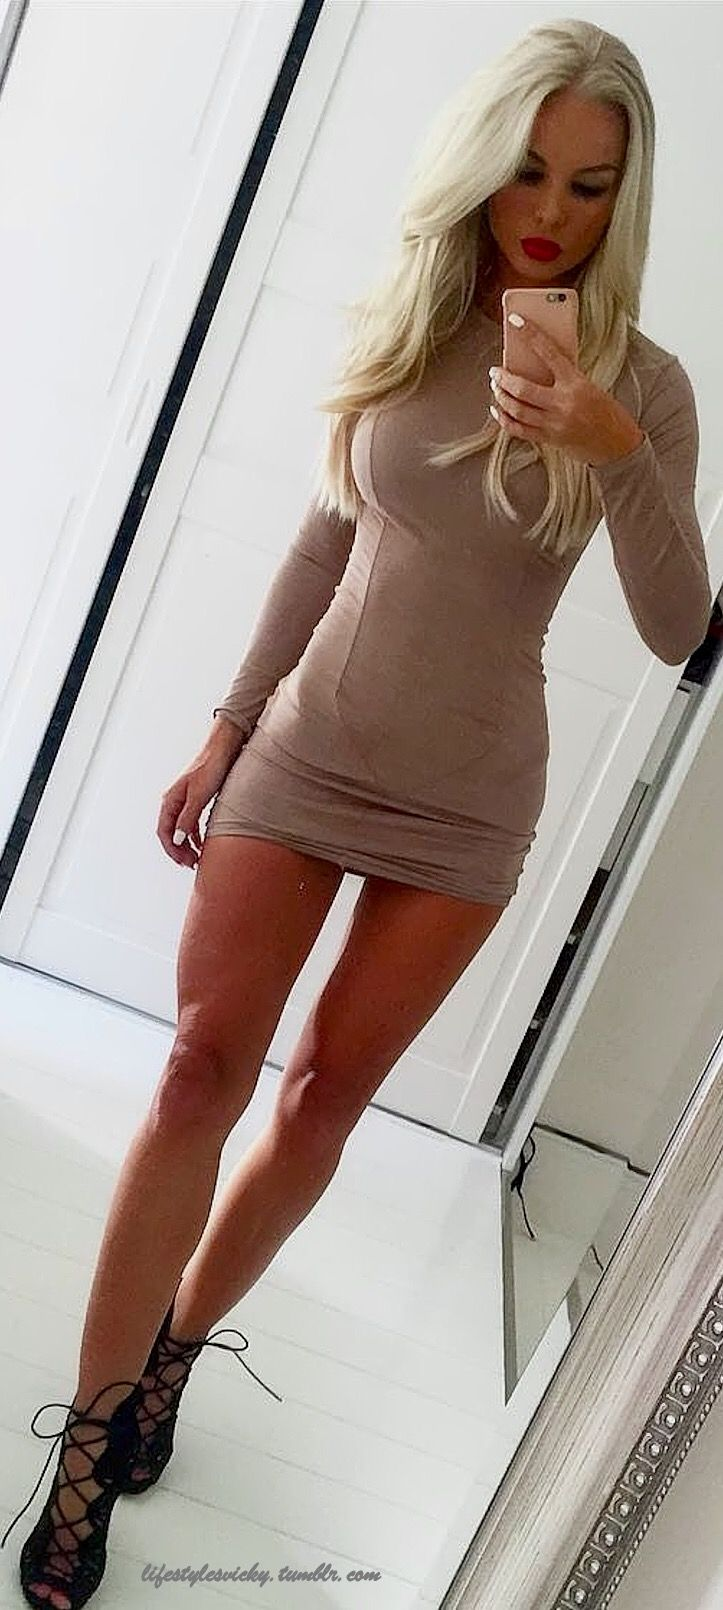 Candy davis topless